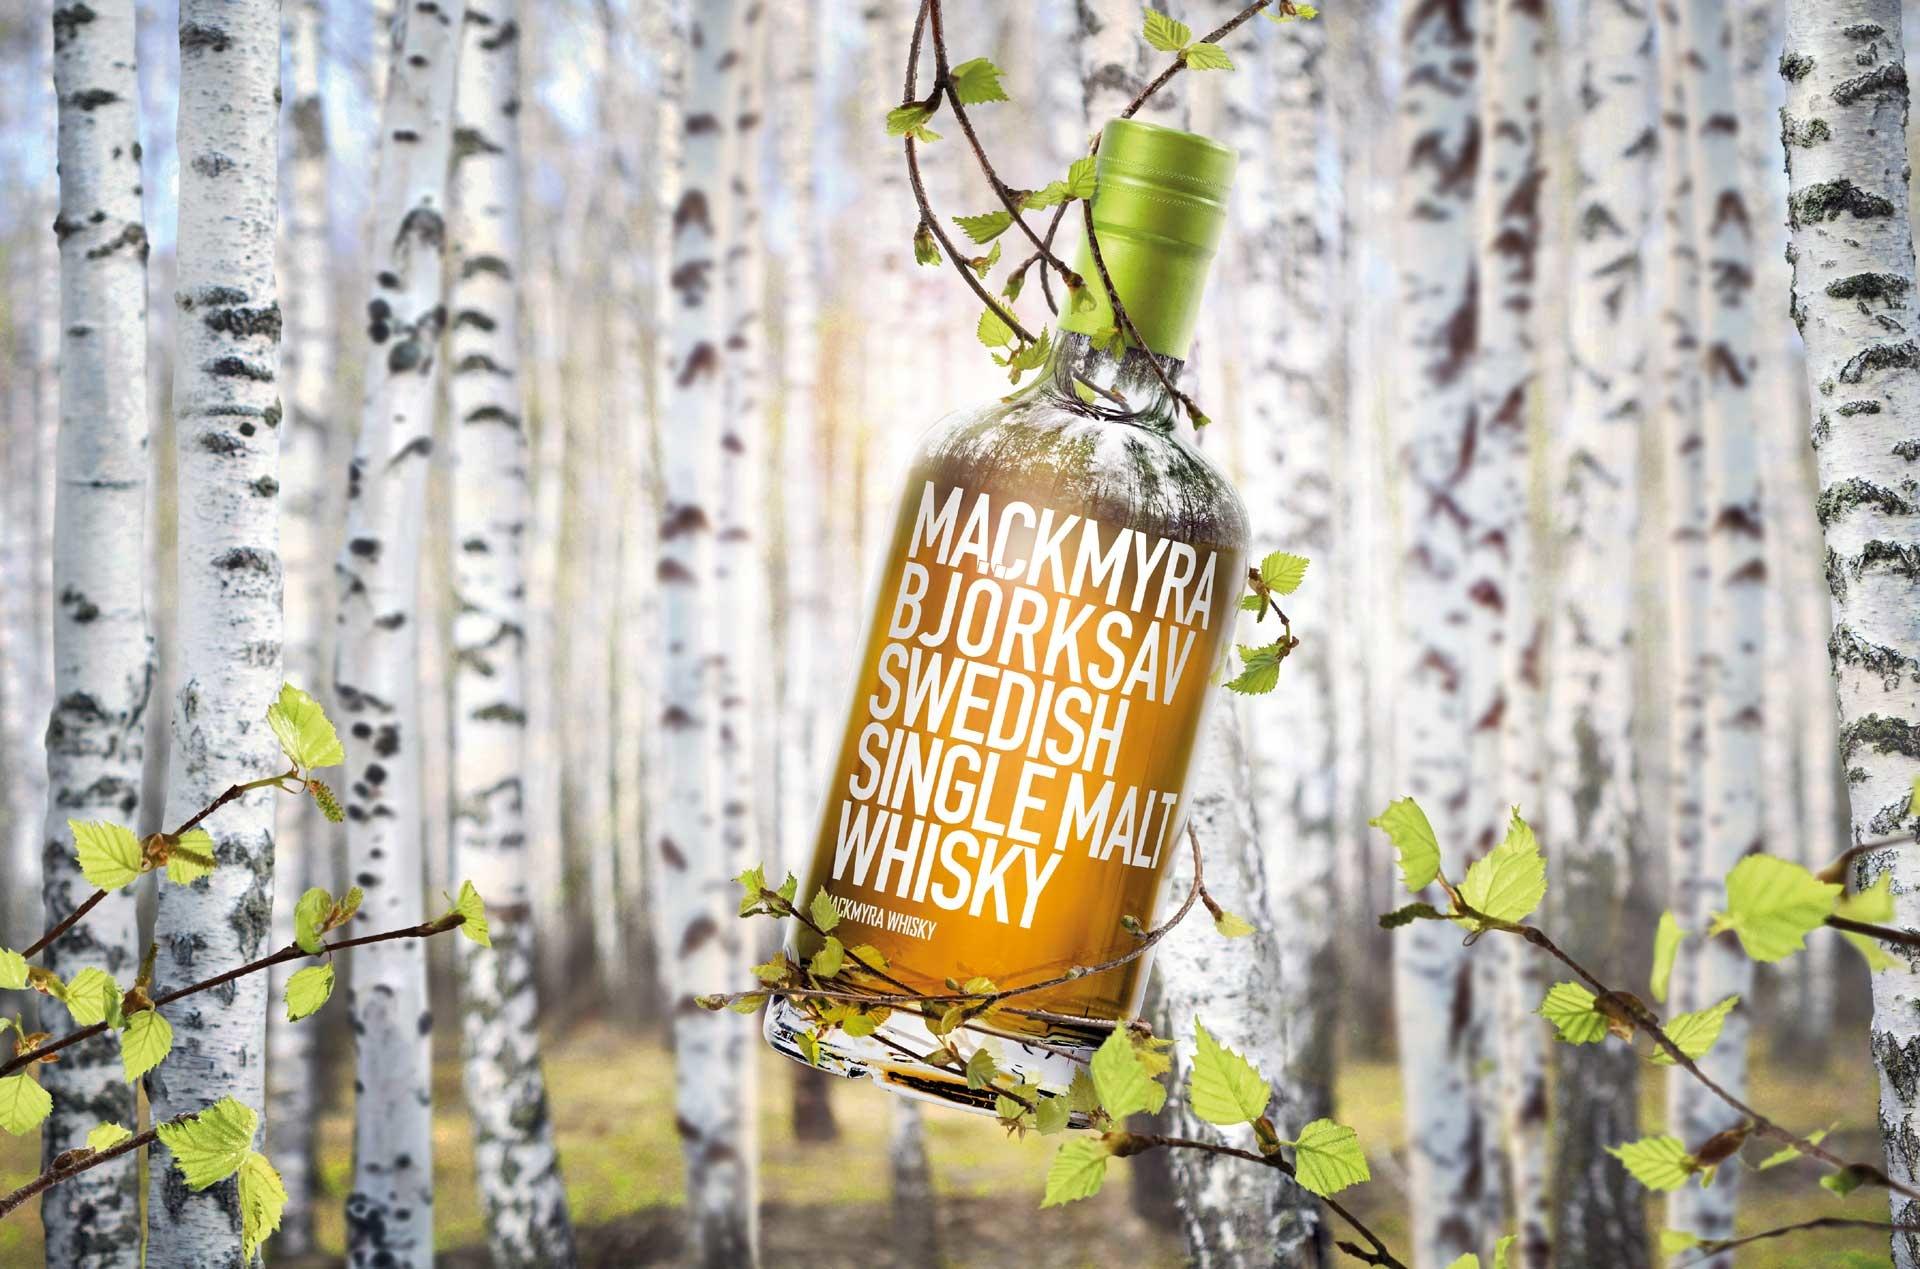 Mackmyra Björksav - Ein schwedischer Whiskyfrühling